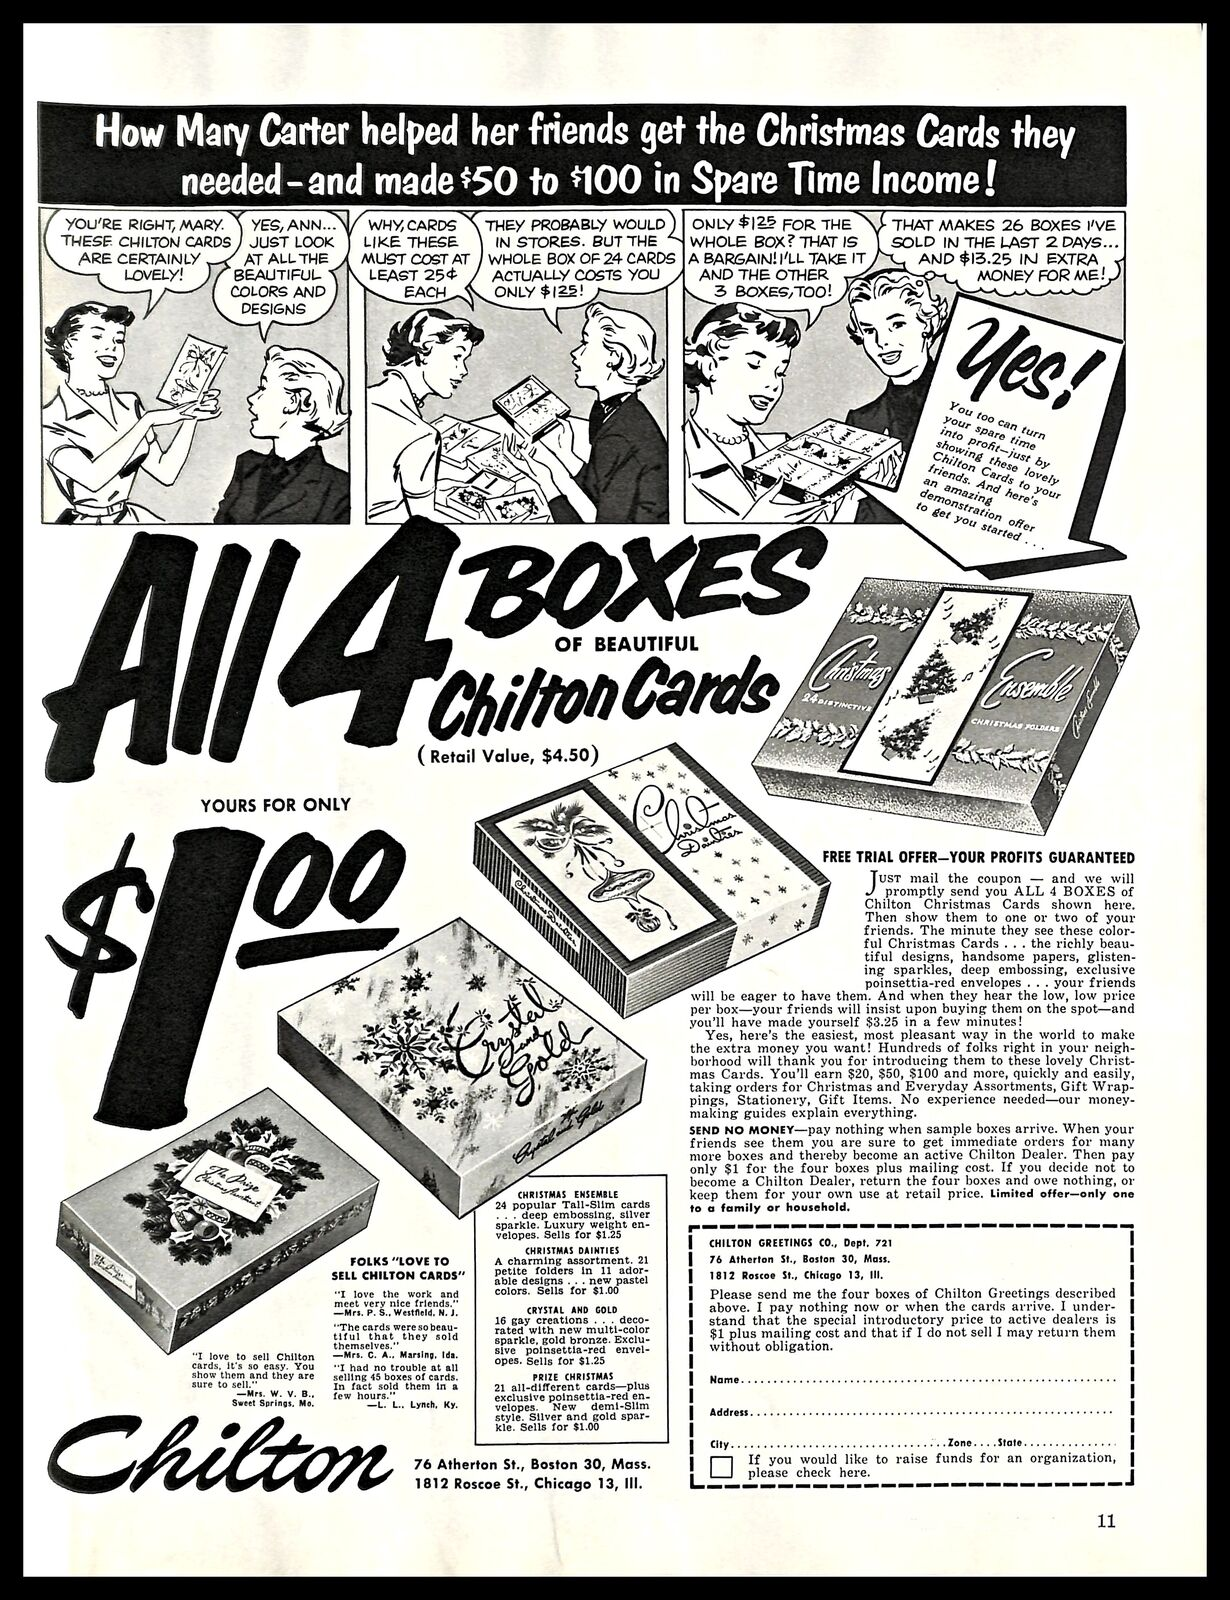 1956 Chilton Christmas Cards Vintage PRINT AD Comic Strip Free Trial ...